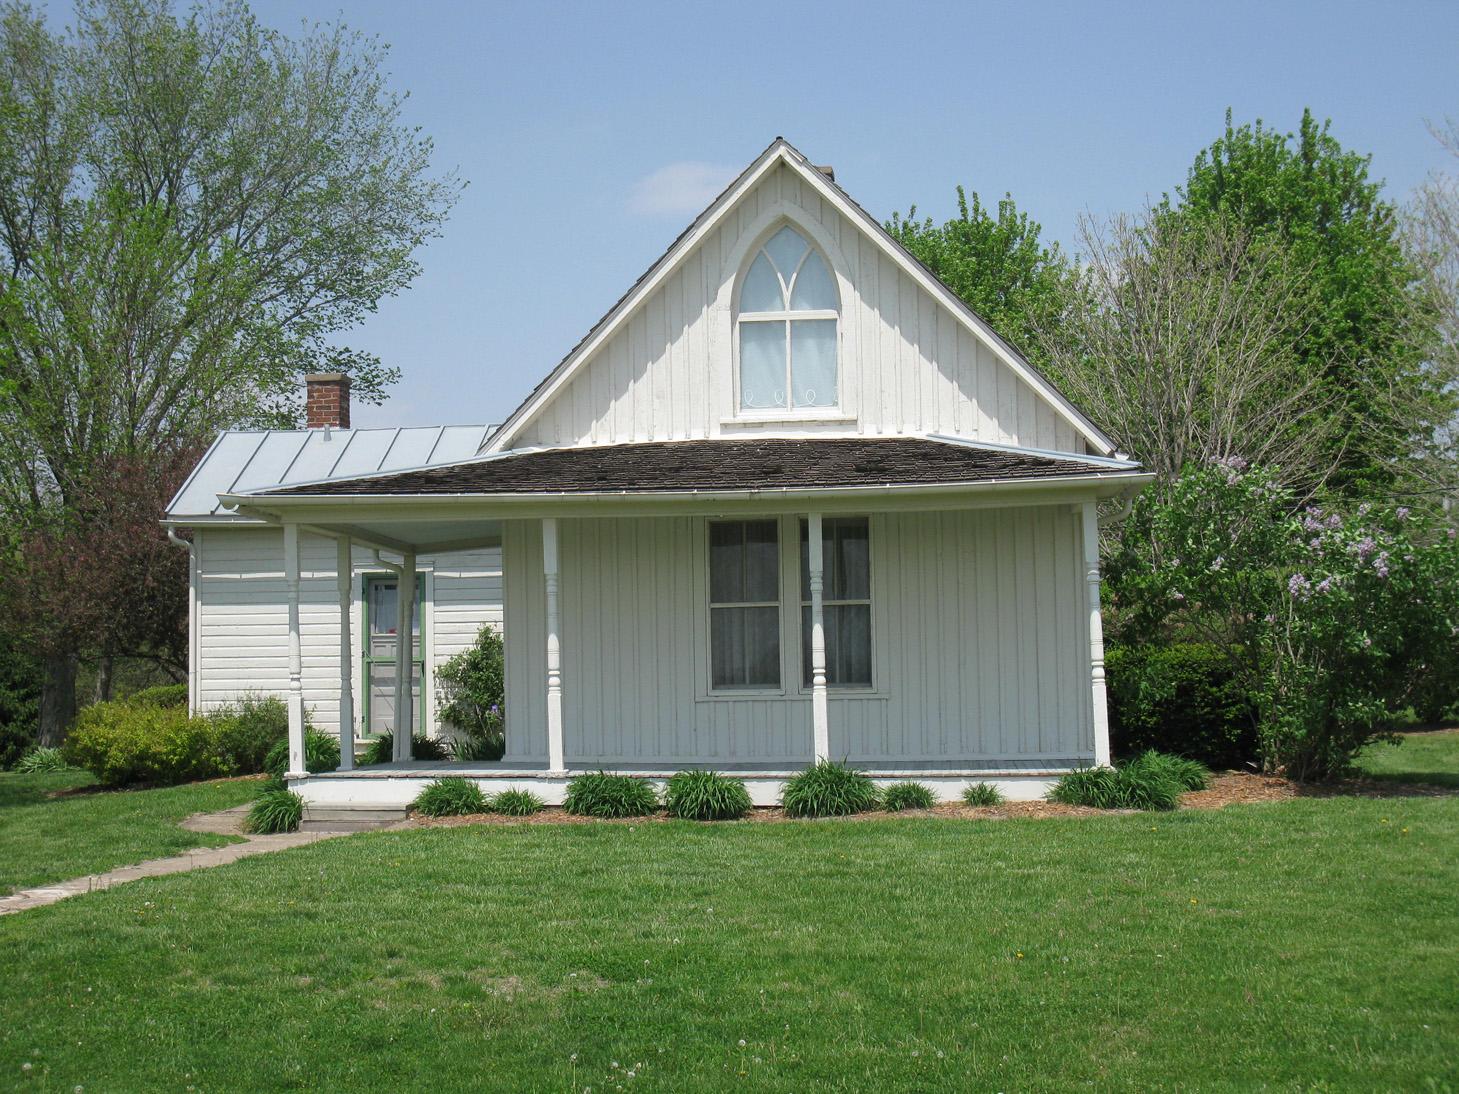 essay contest for house iowa